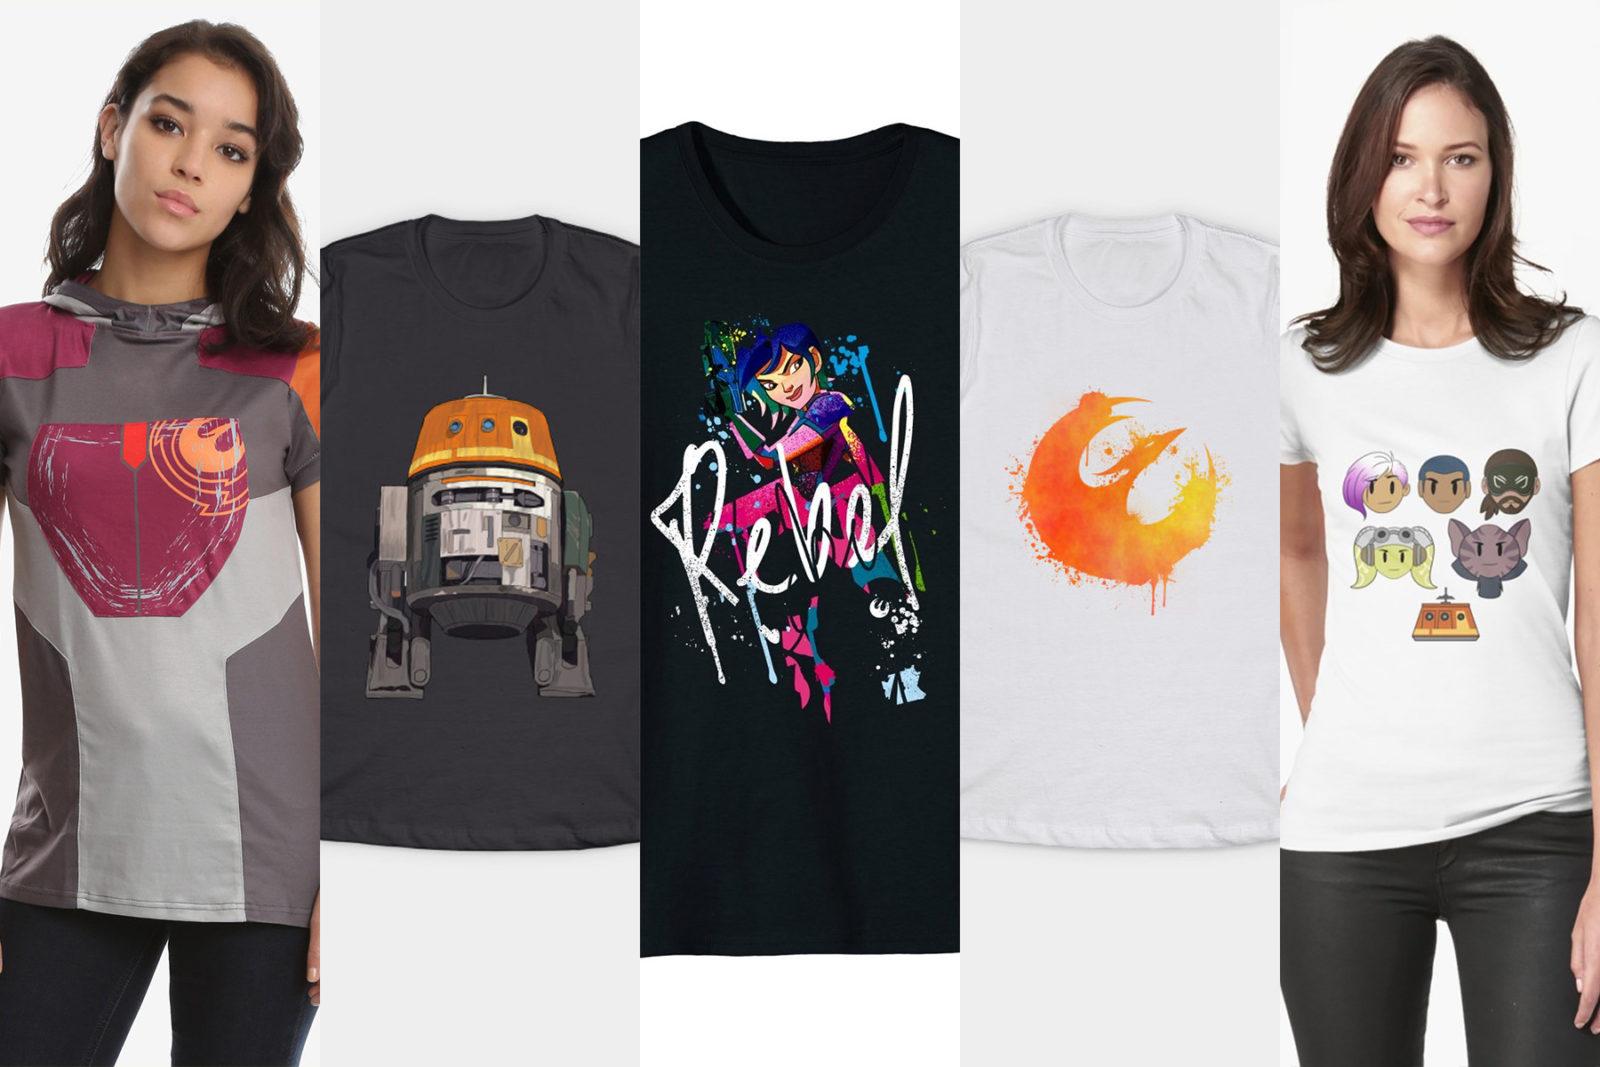 Leia's List – Women's Rebels Themed T-Shirts